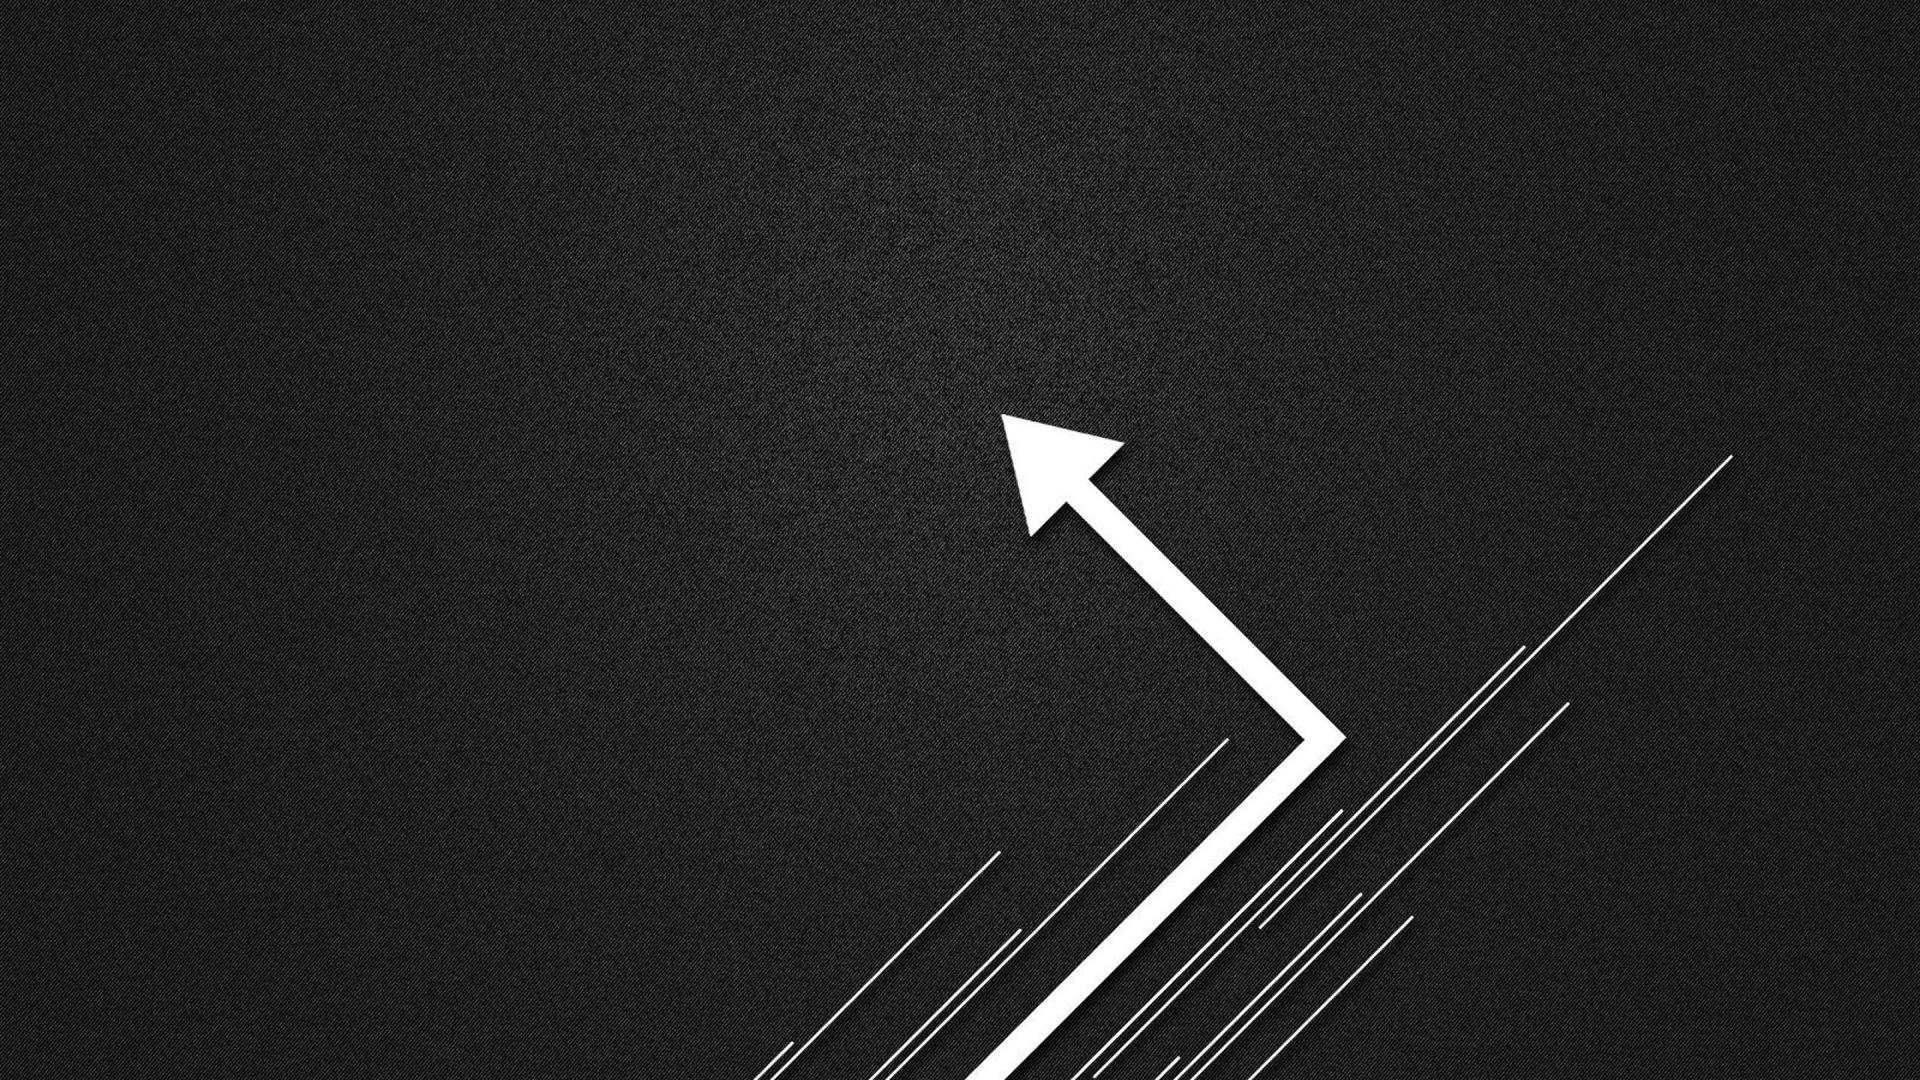 Arrow HD Wallpapers – WallpaperSafari